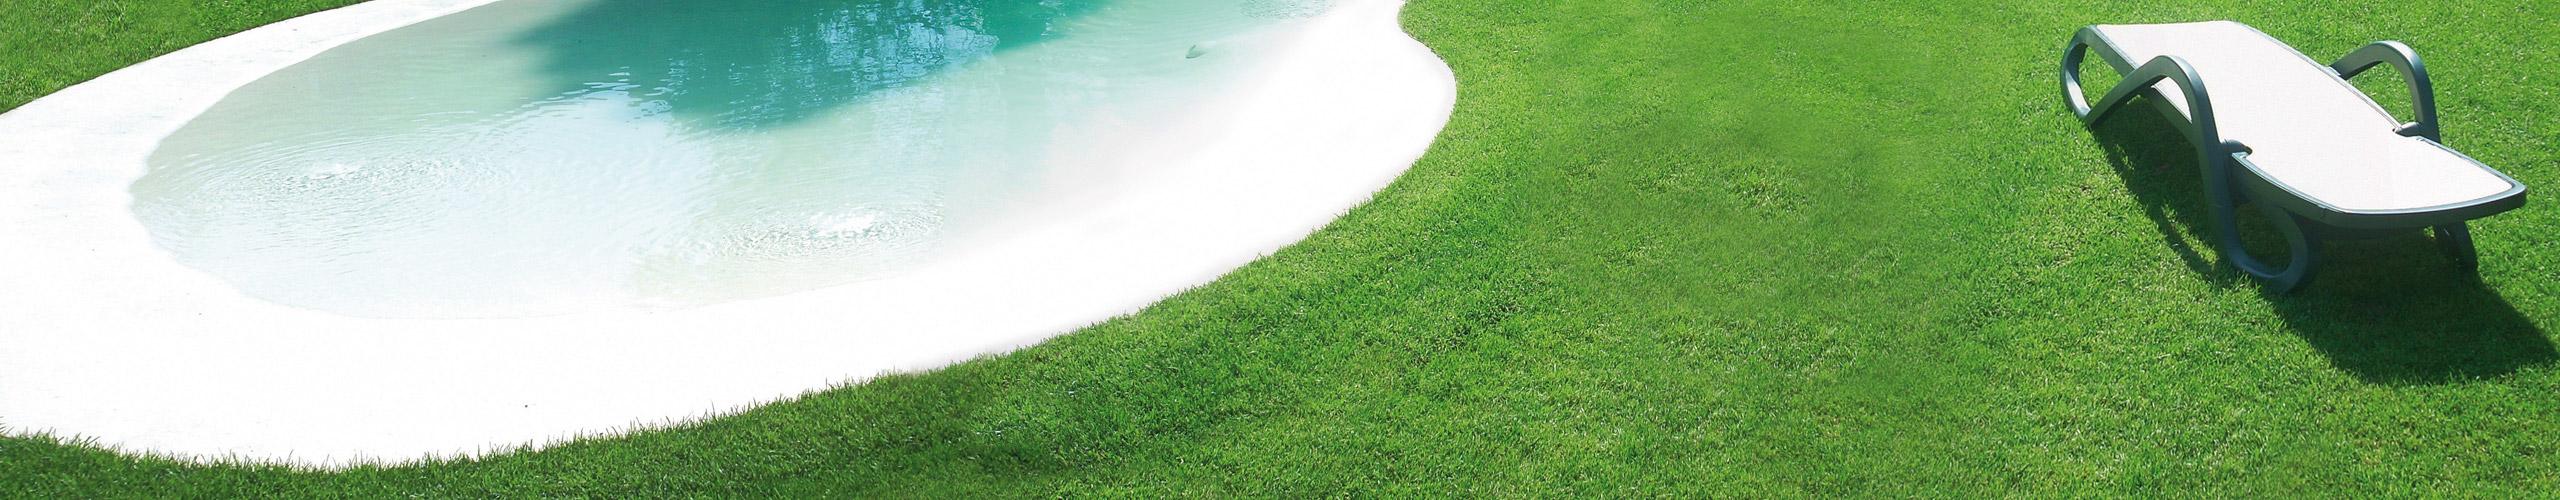 piscine biodesign valleirno piscine. Black Bedroom Furniture Sets. Home Design Ideas